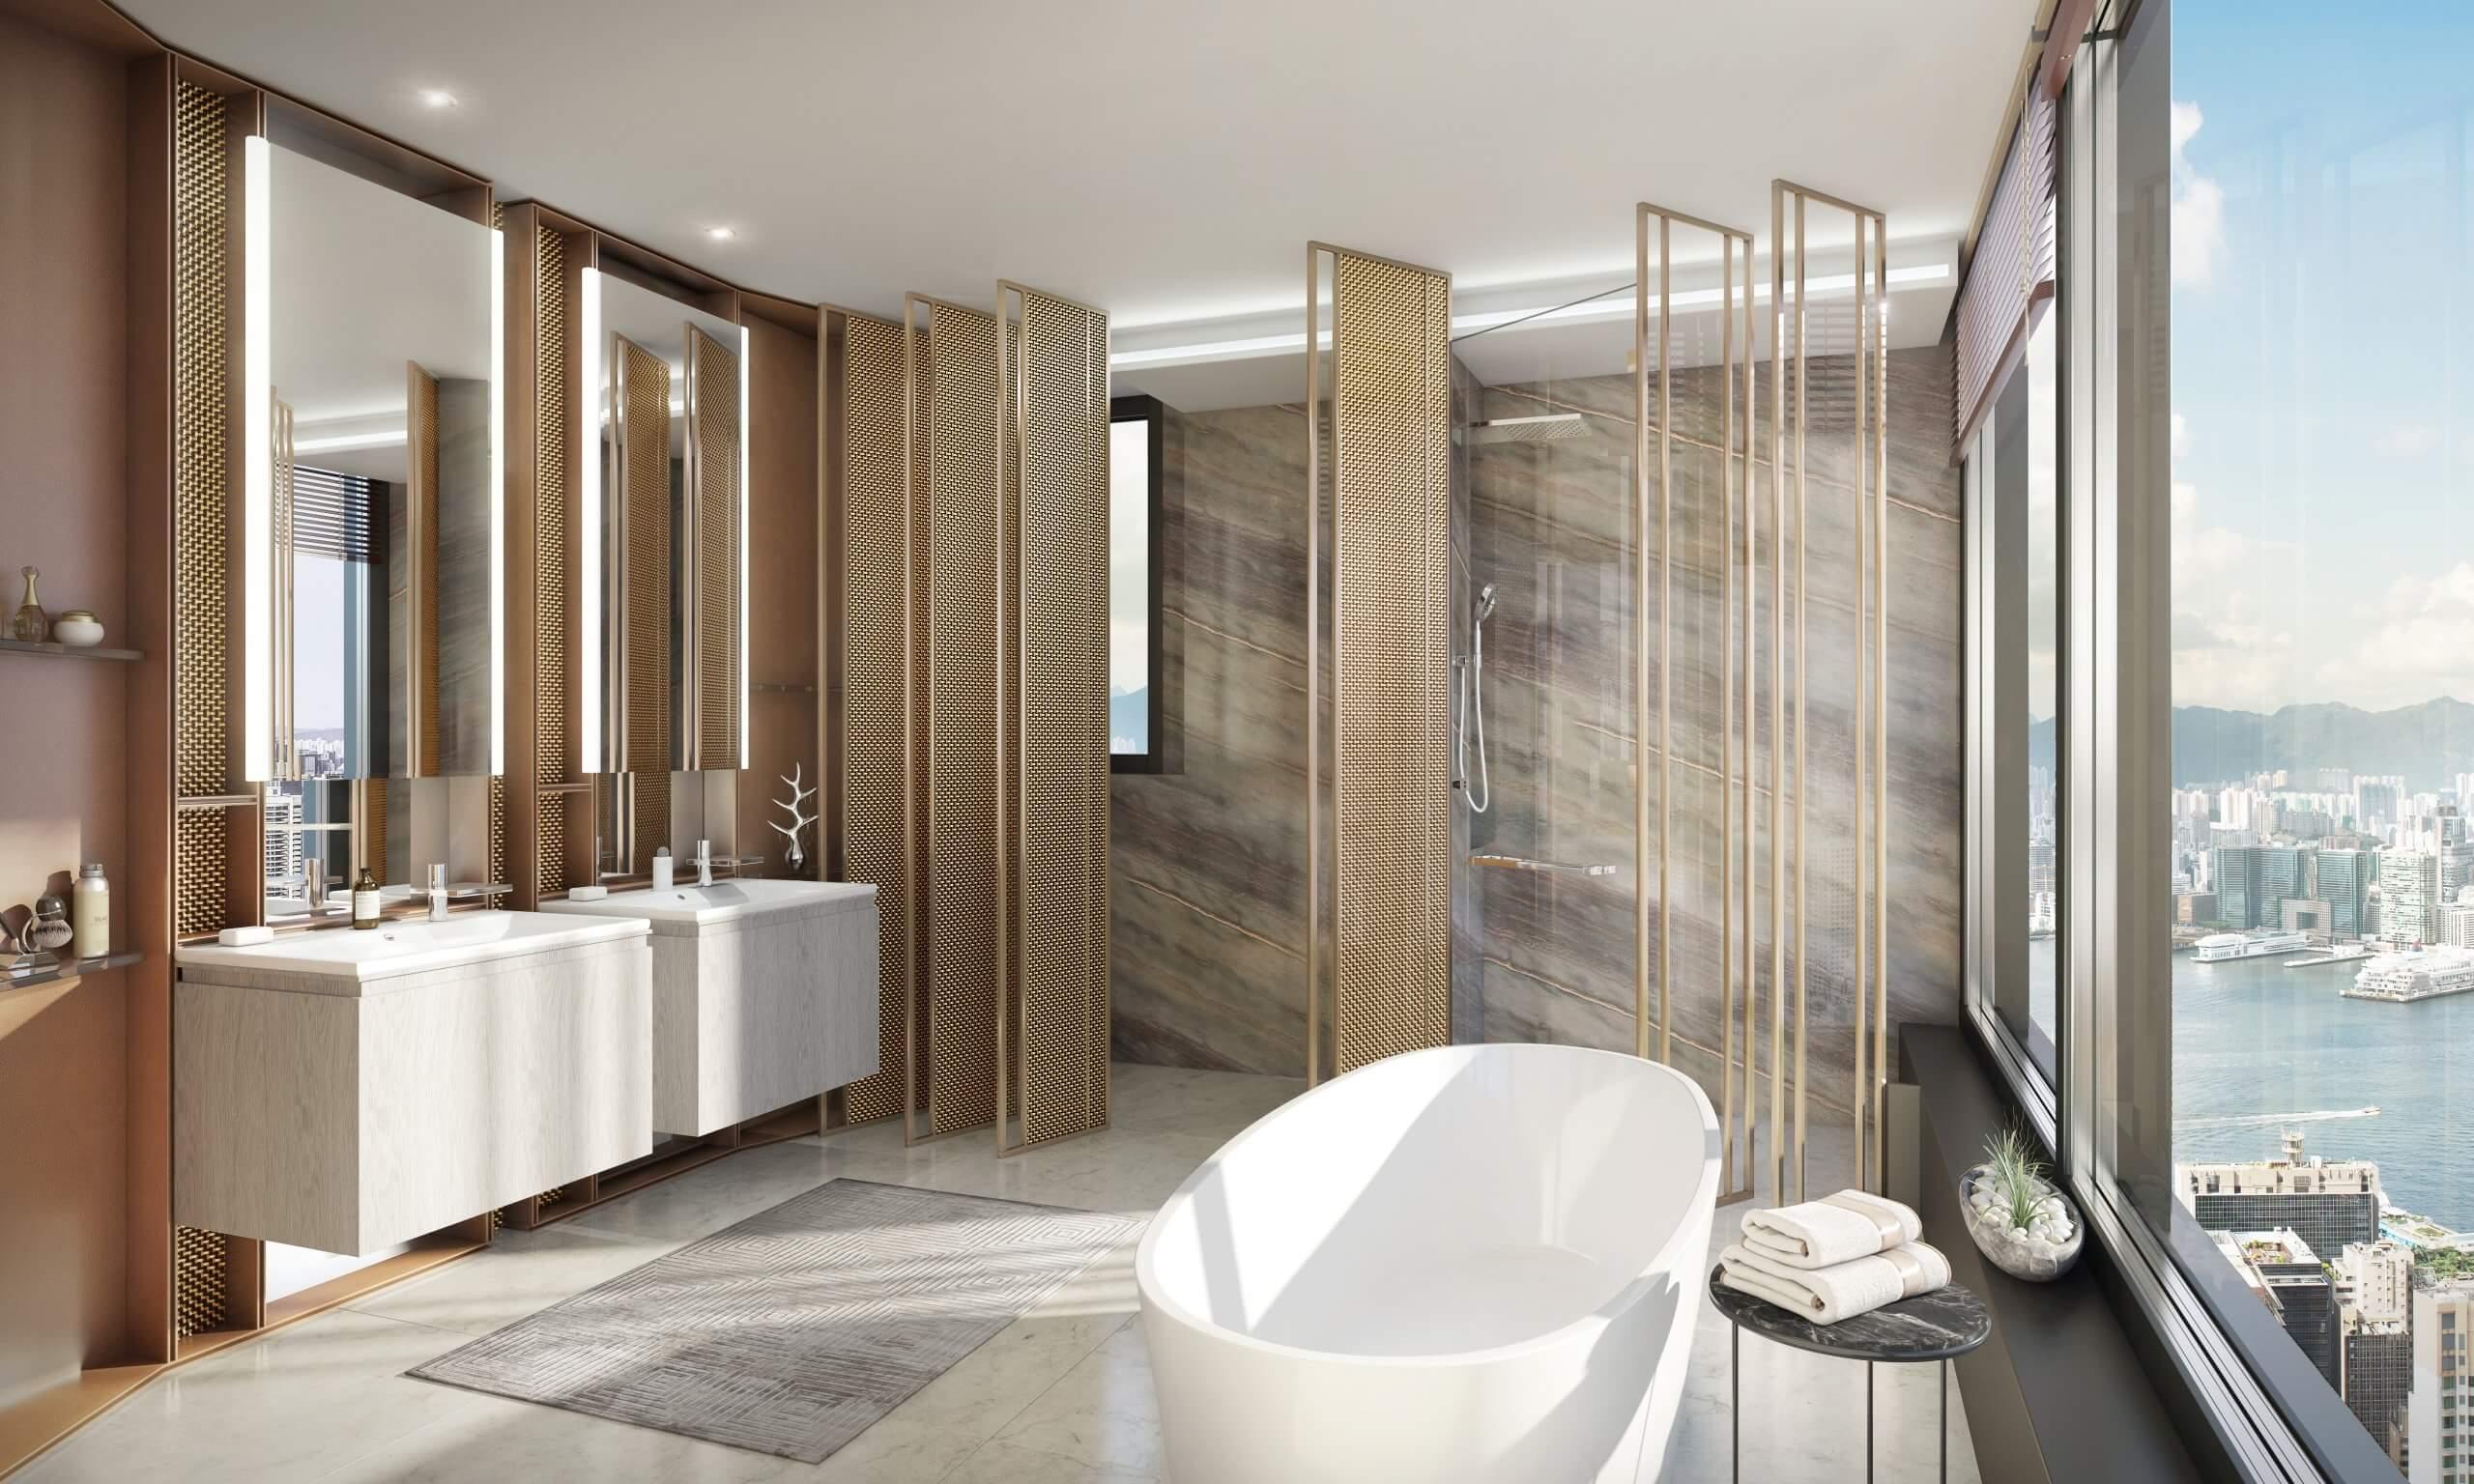 SH001-01-Alassio-Bathroom-R04_01